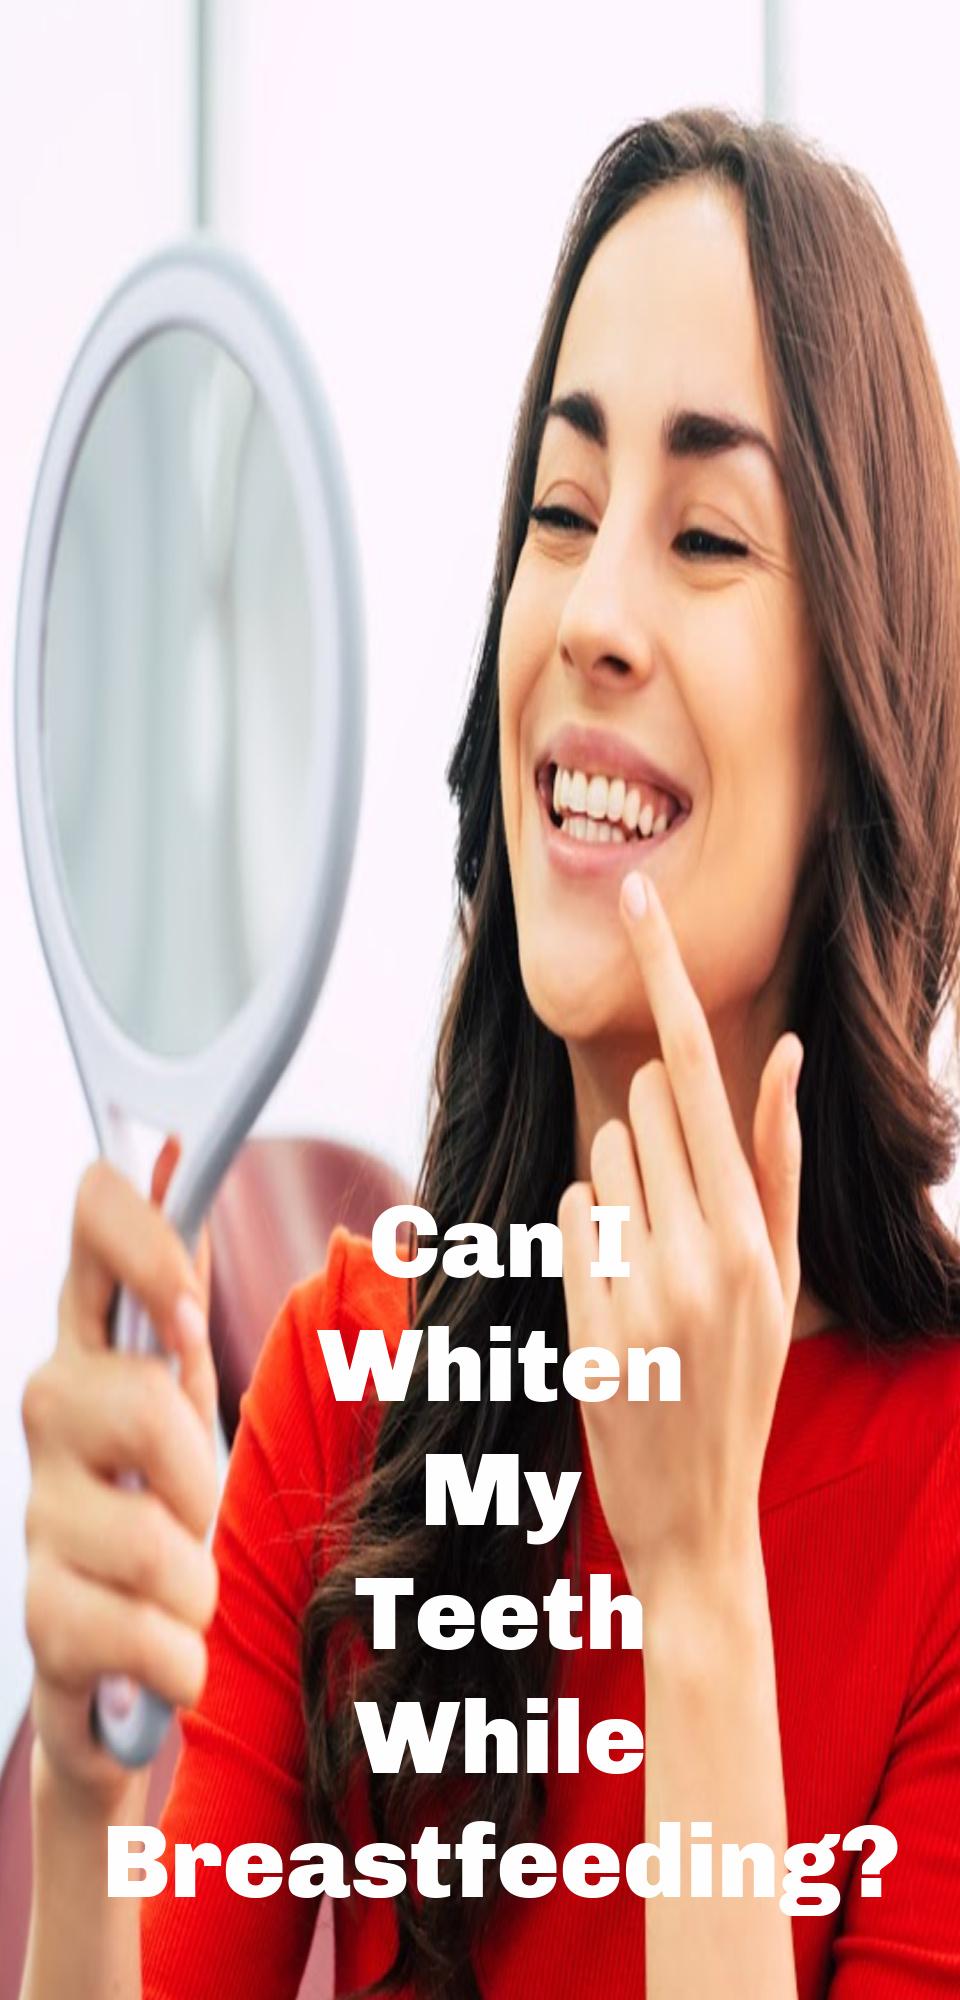 Can I Whiten My Teeth While Breastfeeding?